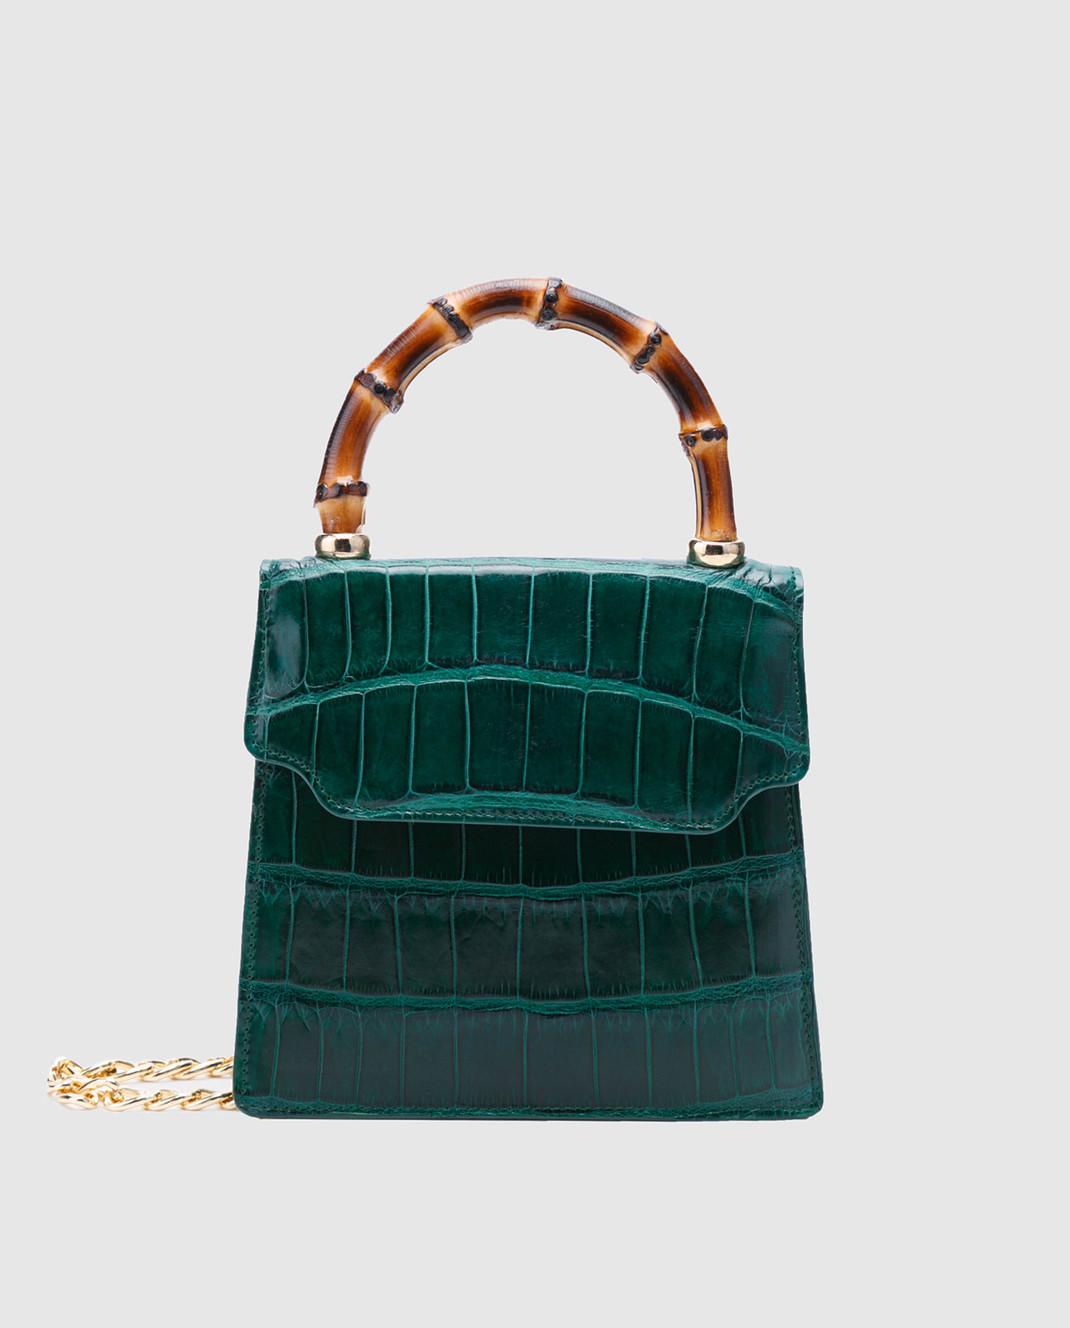 Bochicchio Зеленая кожаная сумка CROCOCLUTCH3